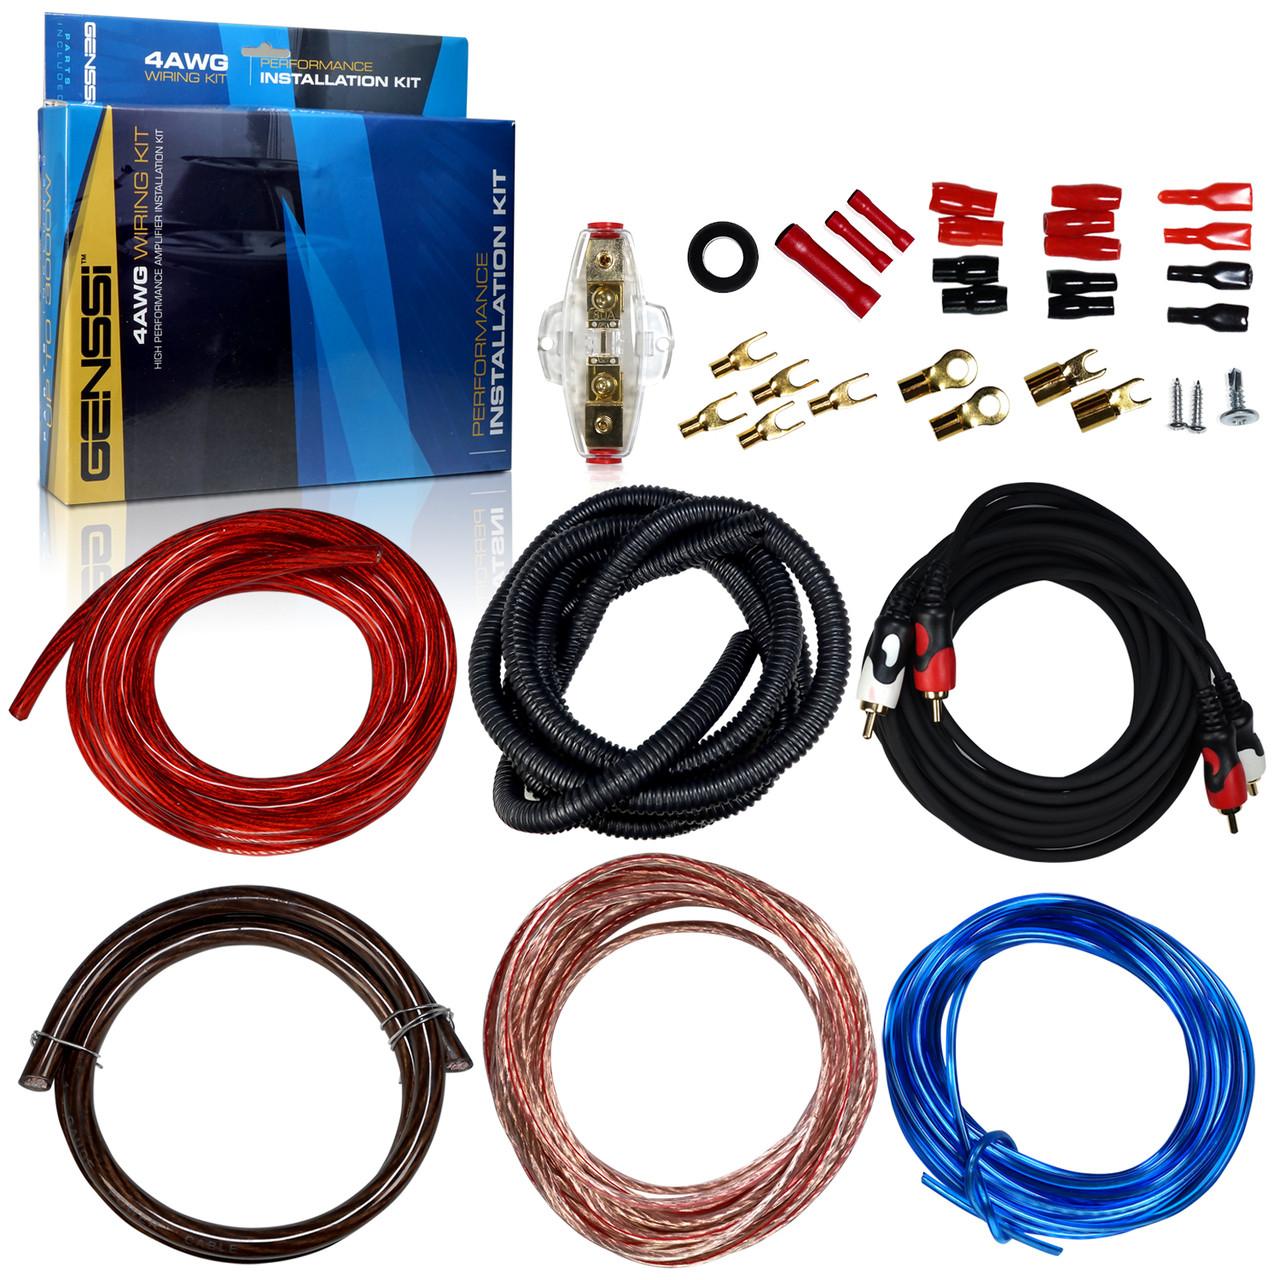 medium resolution of 4awg car audio installation wiring kit 4 gauge genssi 4 gauge wiring kit car audio